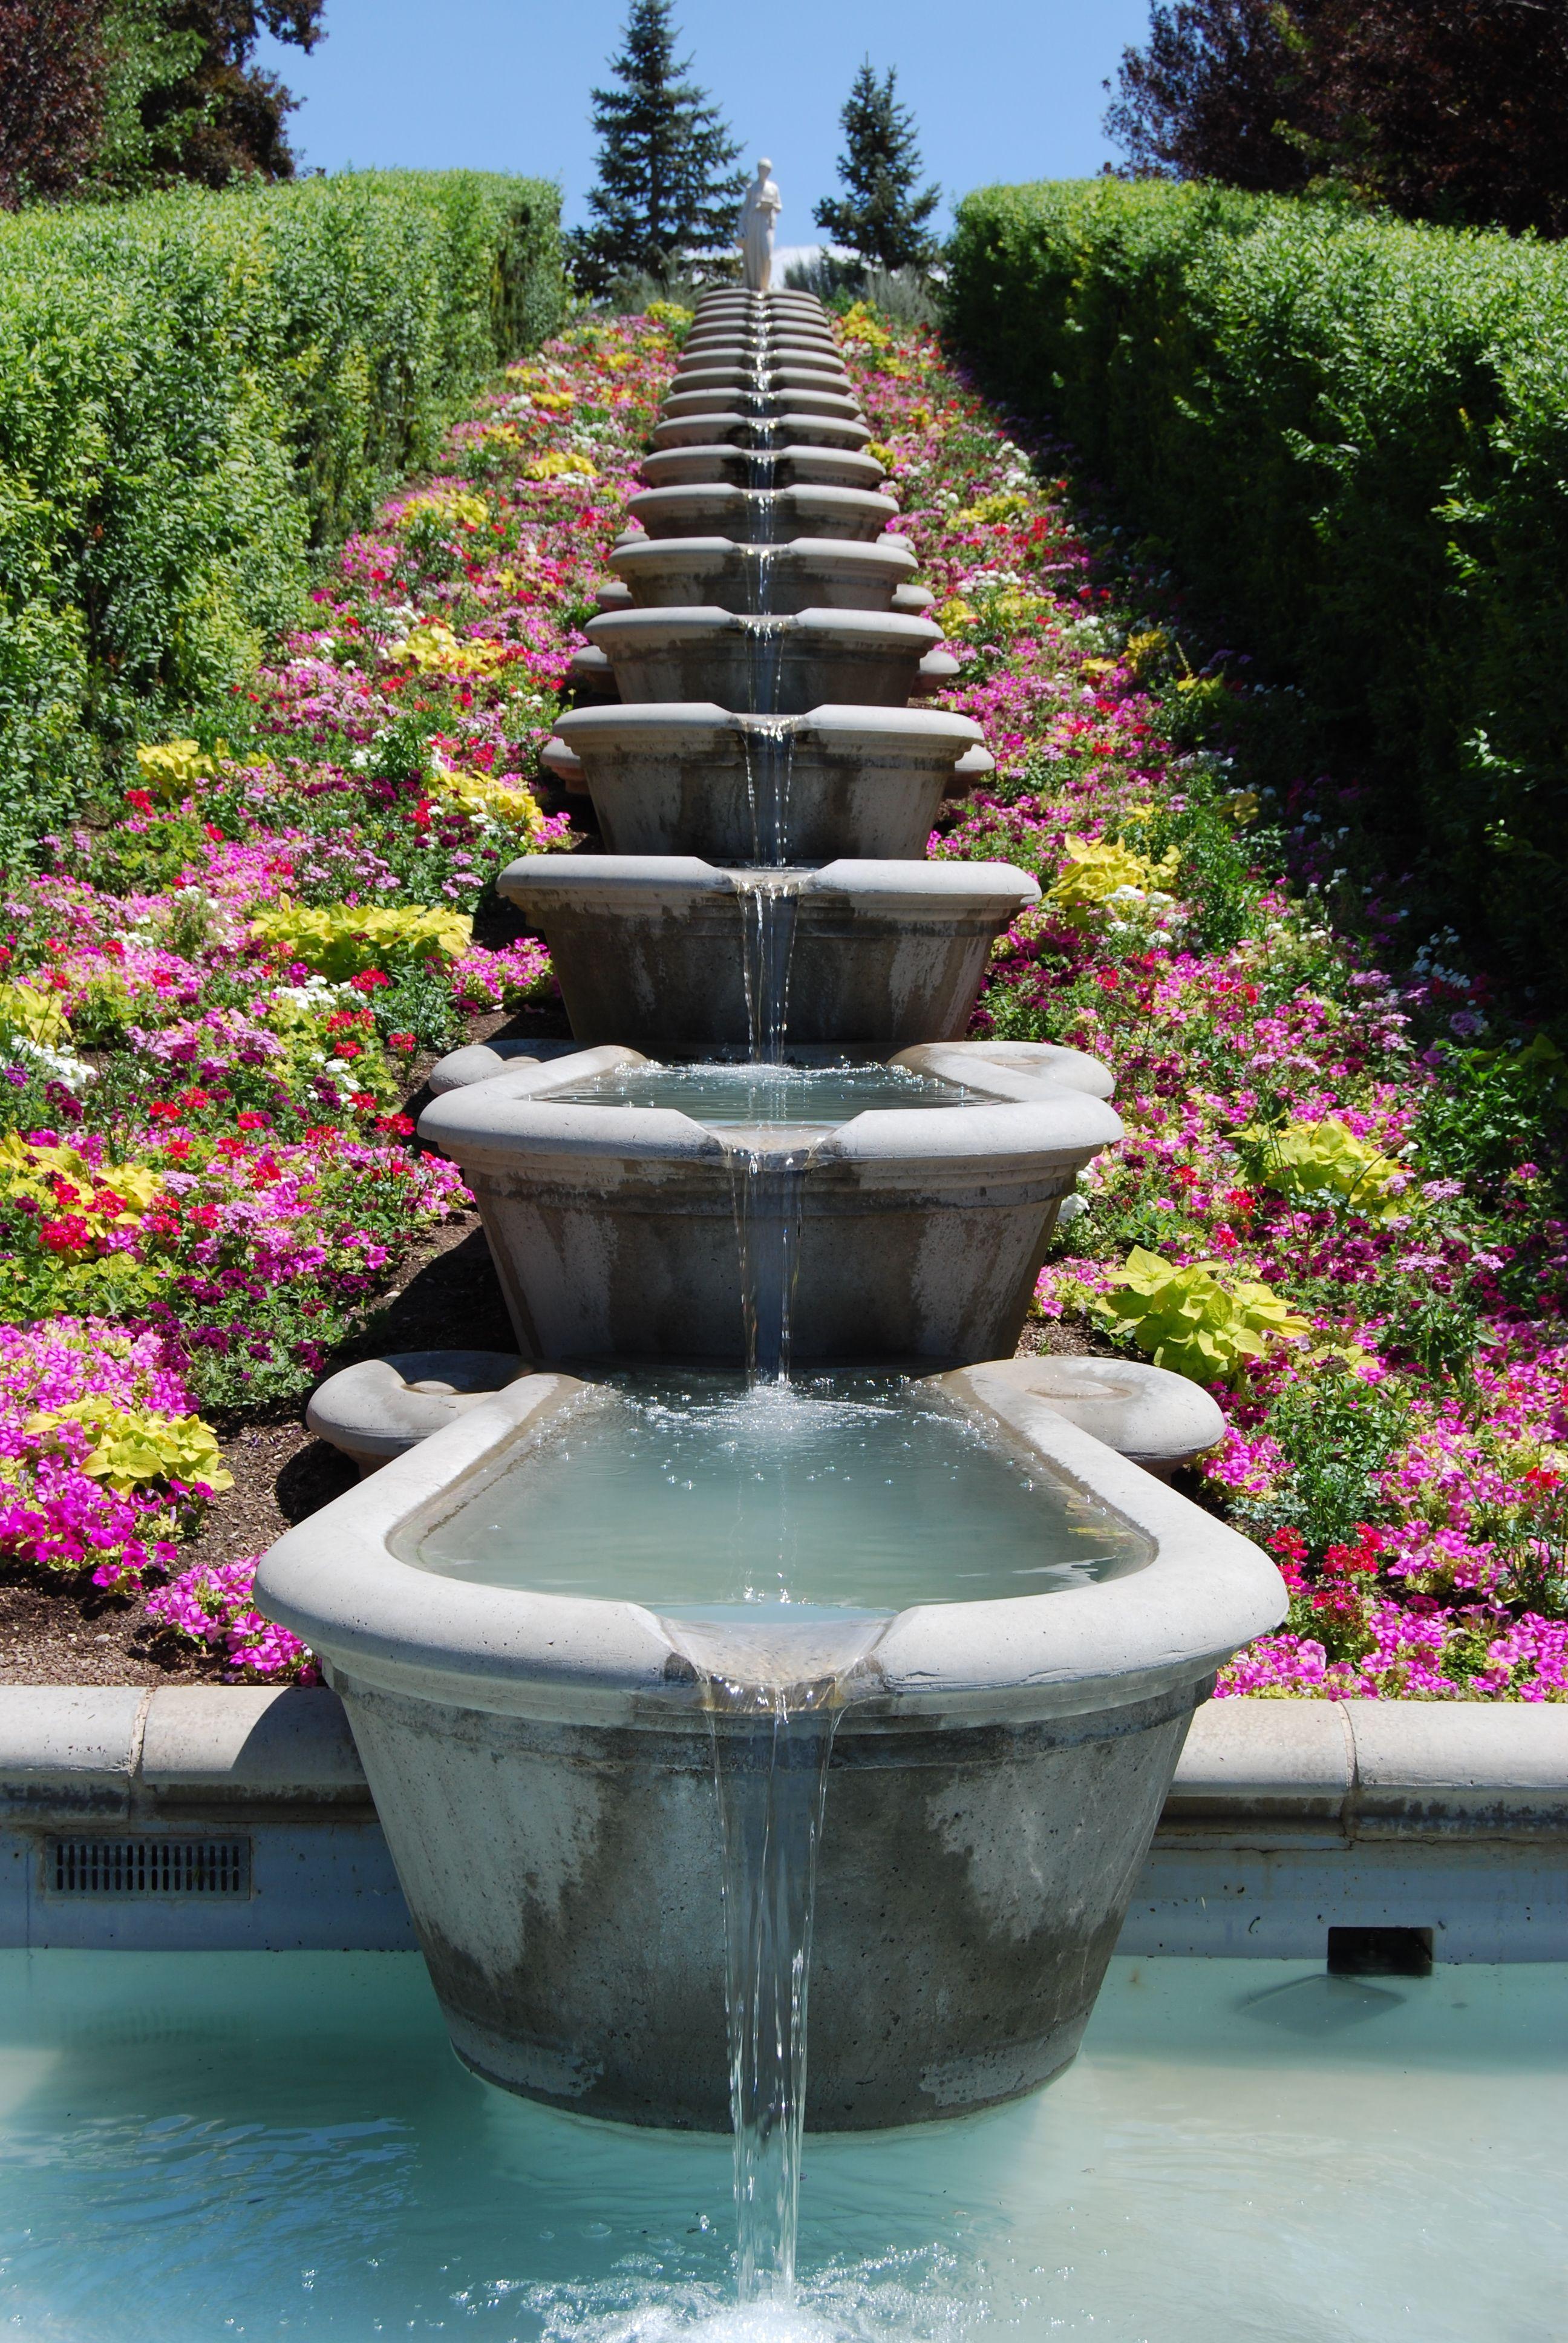 Pin By Gary Whitton On Gorgeous Gardens Beautiful Home Gardens Famous Gardens Italian Garden